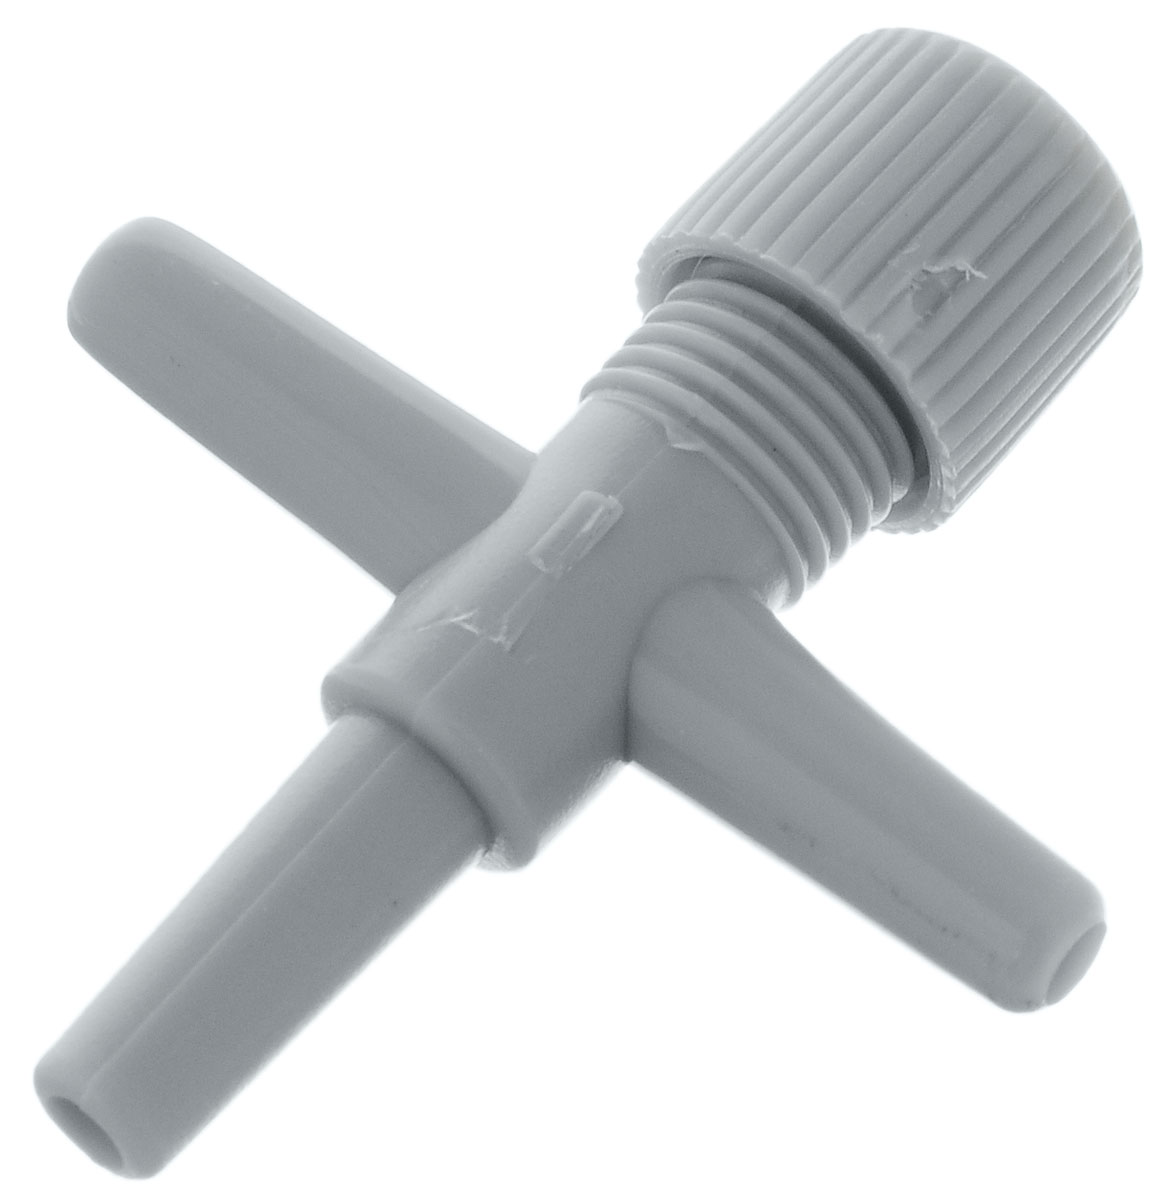 Краник-тройник для компрессорной трубки Barbus, диаметр 4 мм